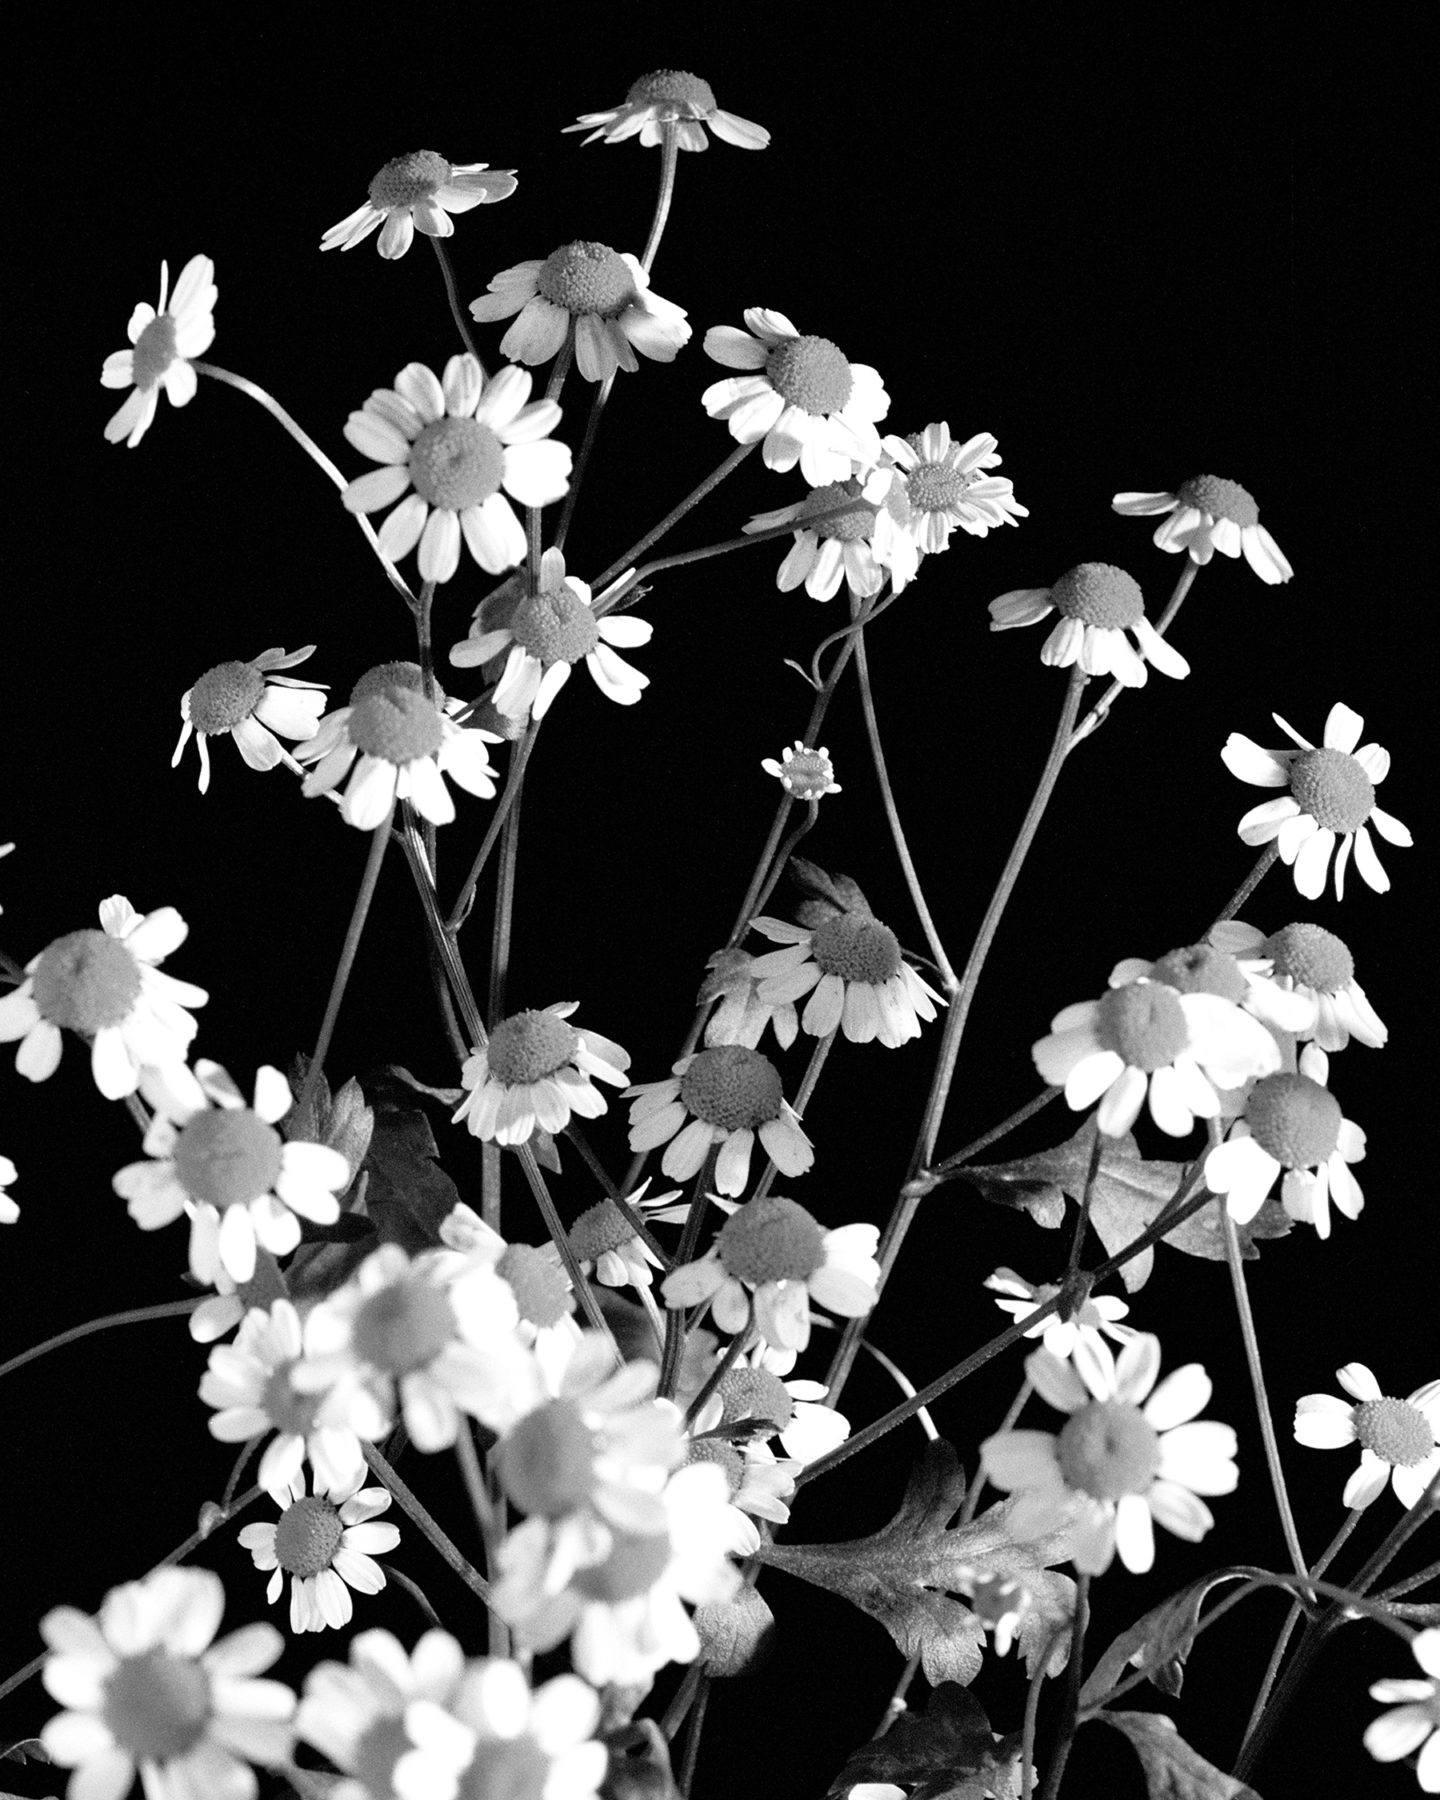 IGNANT-Photography-Brian-Kanagaki-Golden-Persimmons-2-015